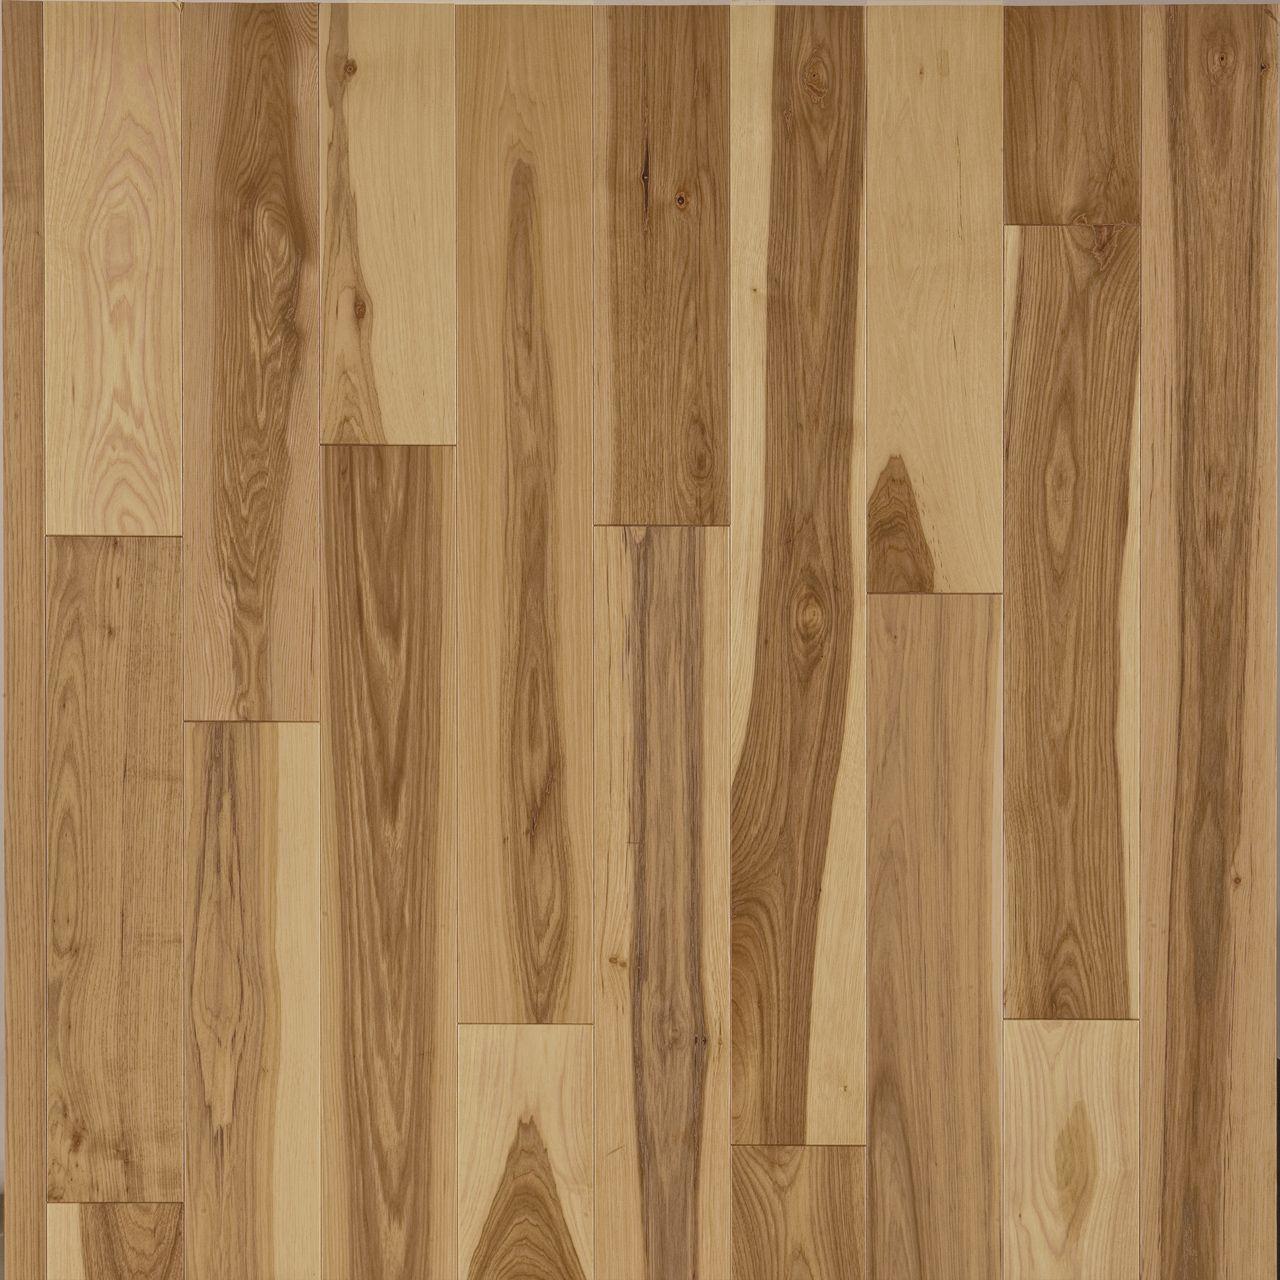 hickory, natural hardwood flooring Preverco Deco